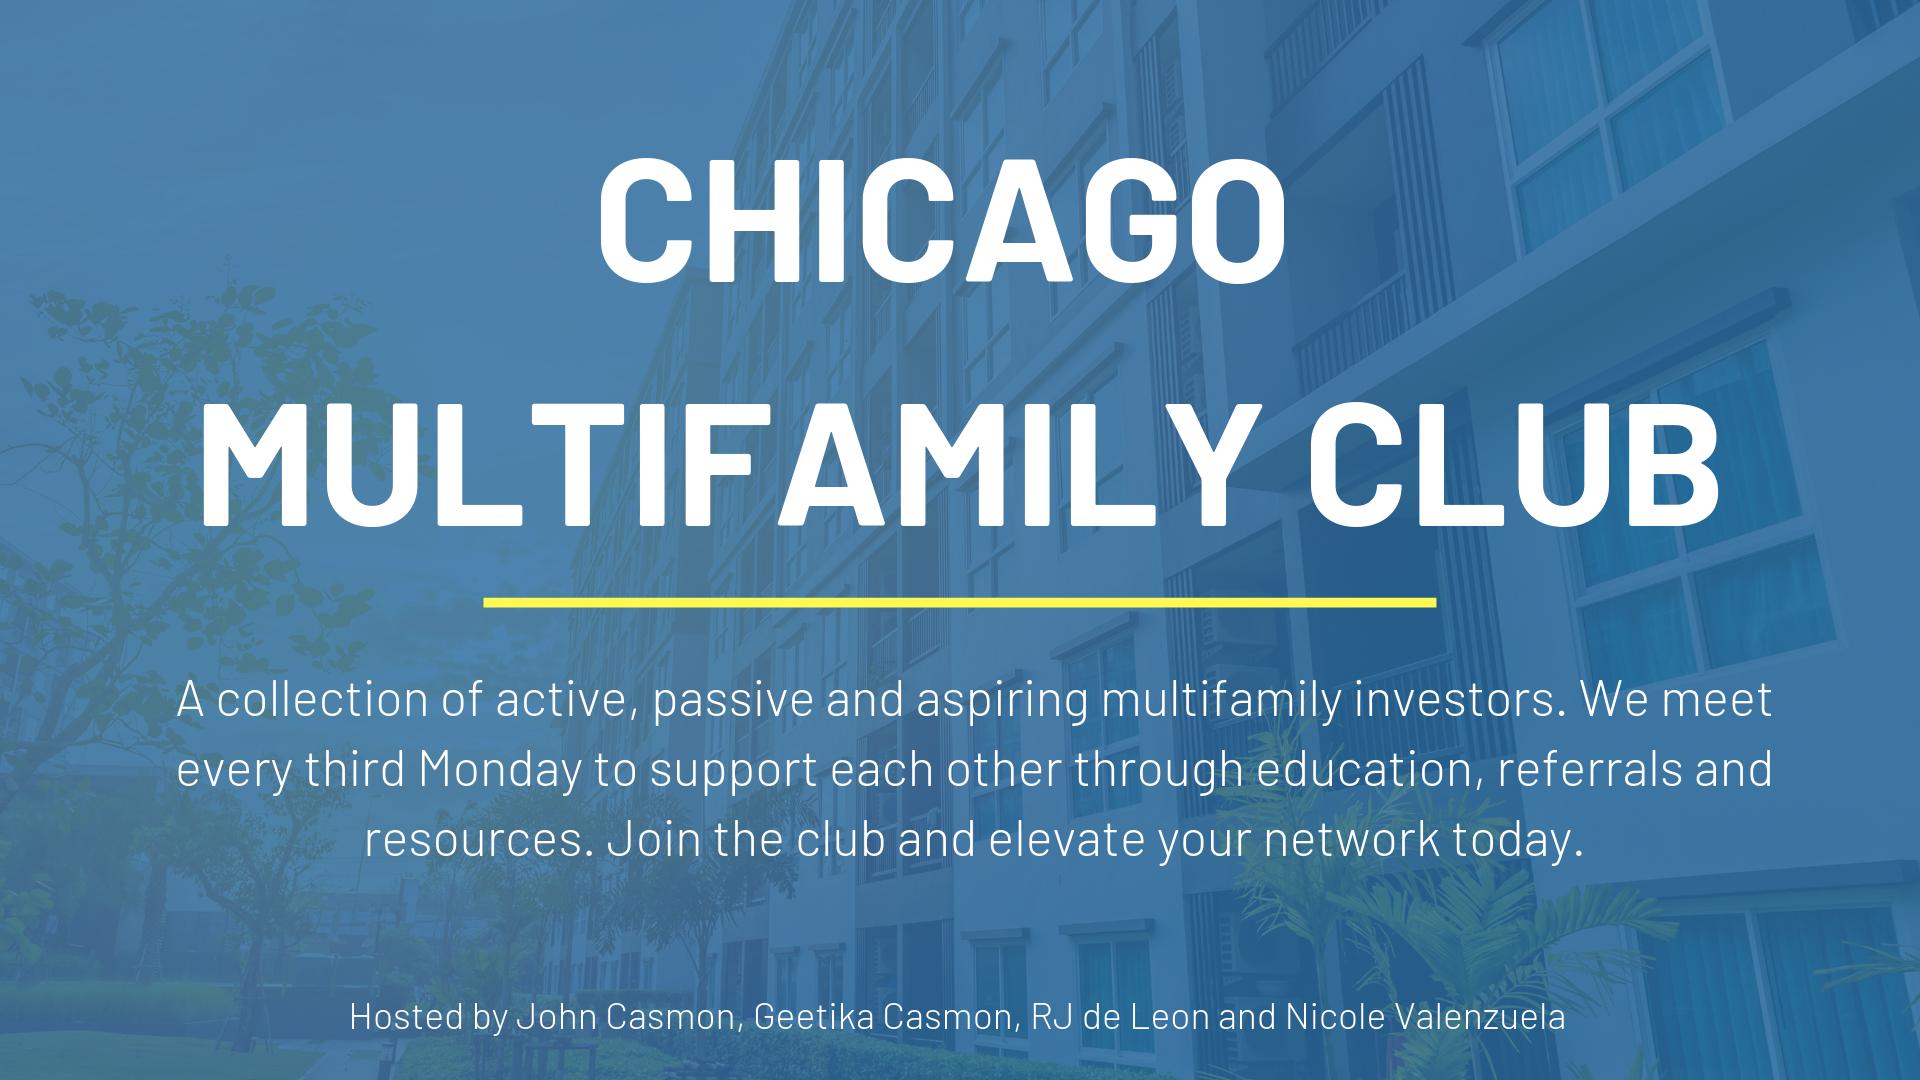 Chicago Multifamily Club